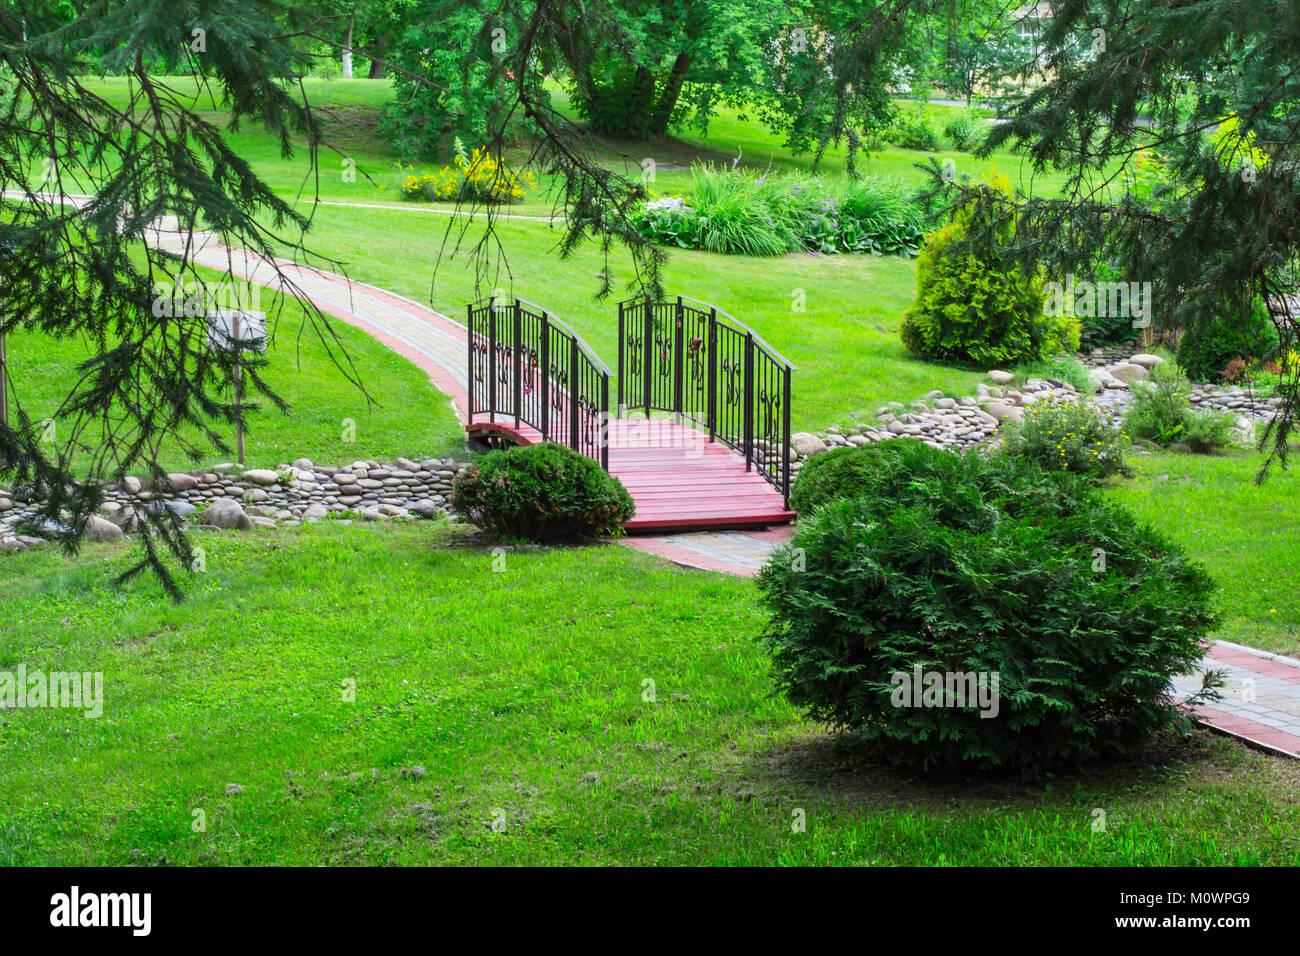 Bridge Over The Brook In The Park Landscape Design Concept Stock